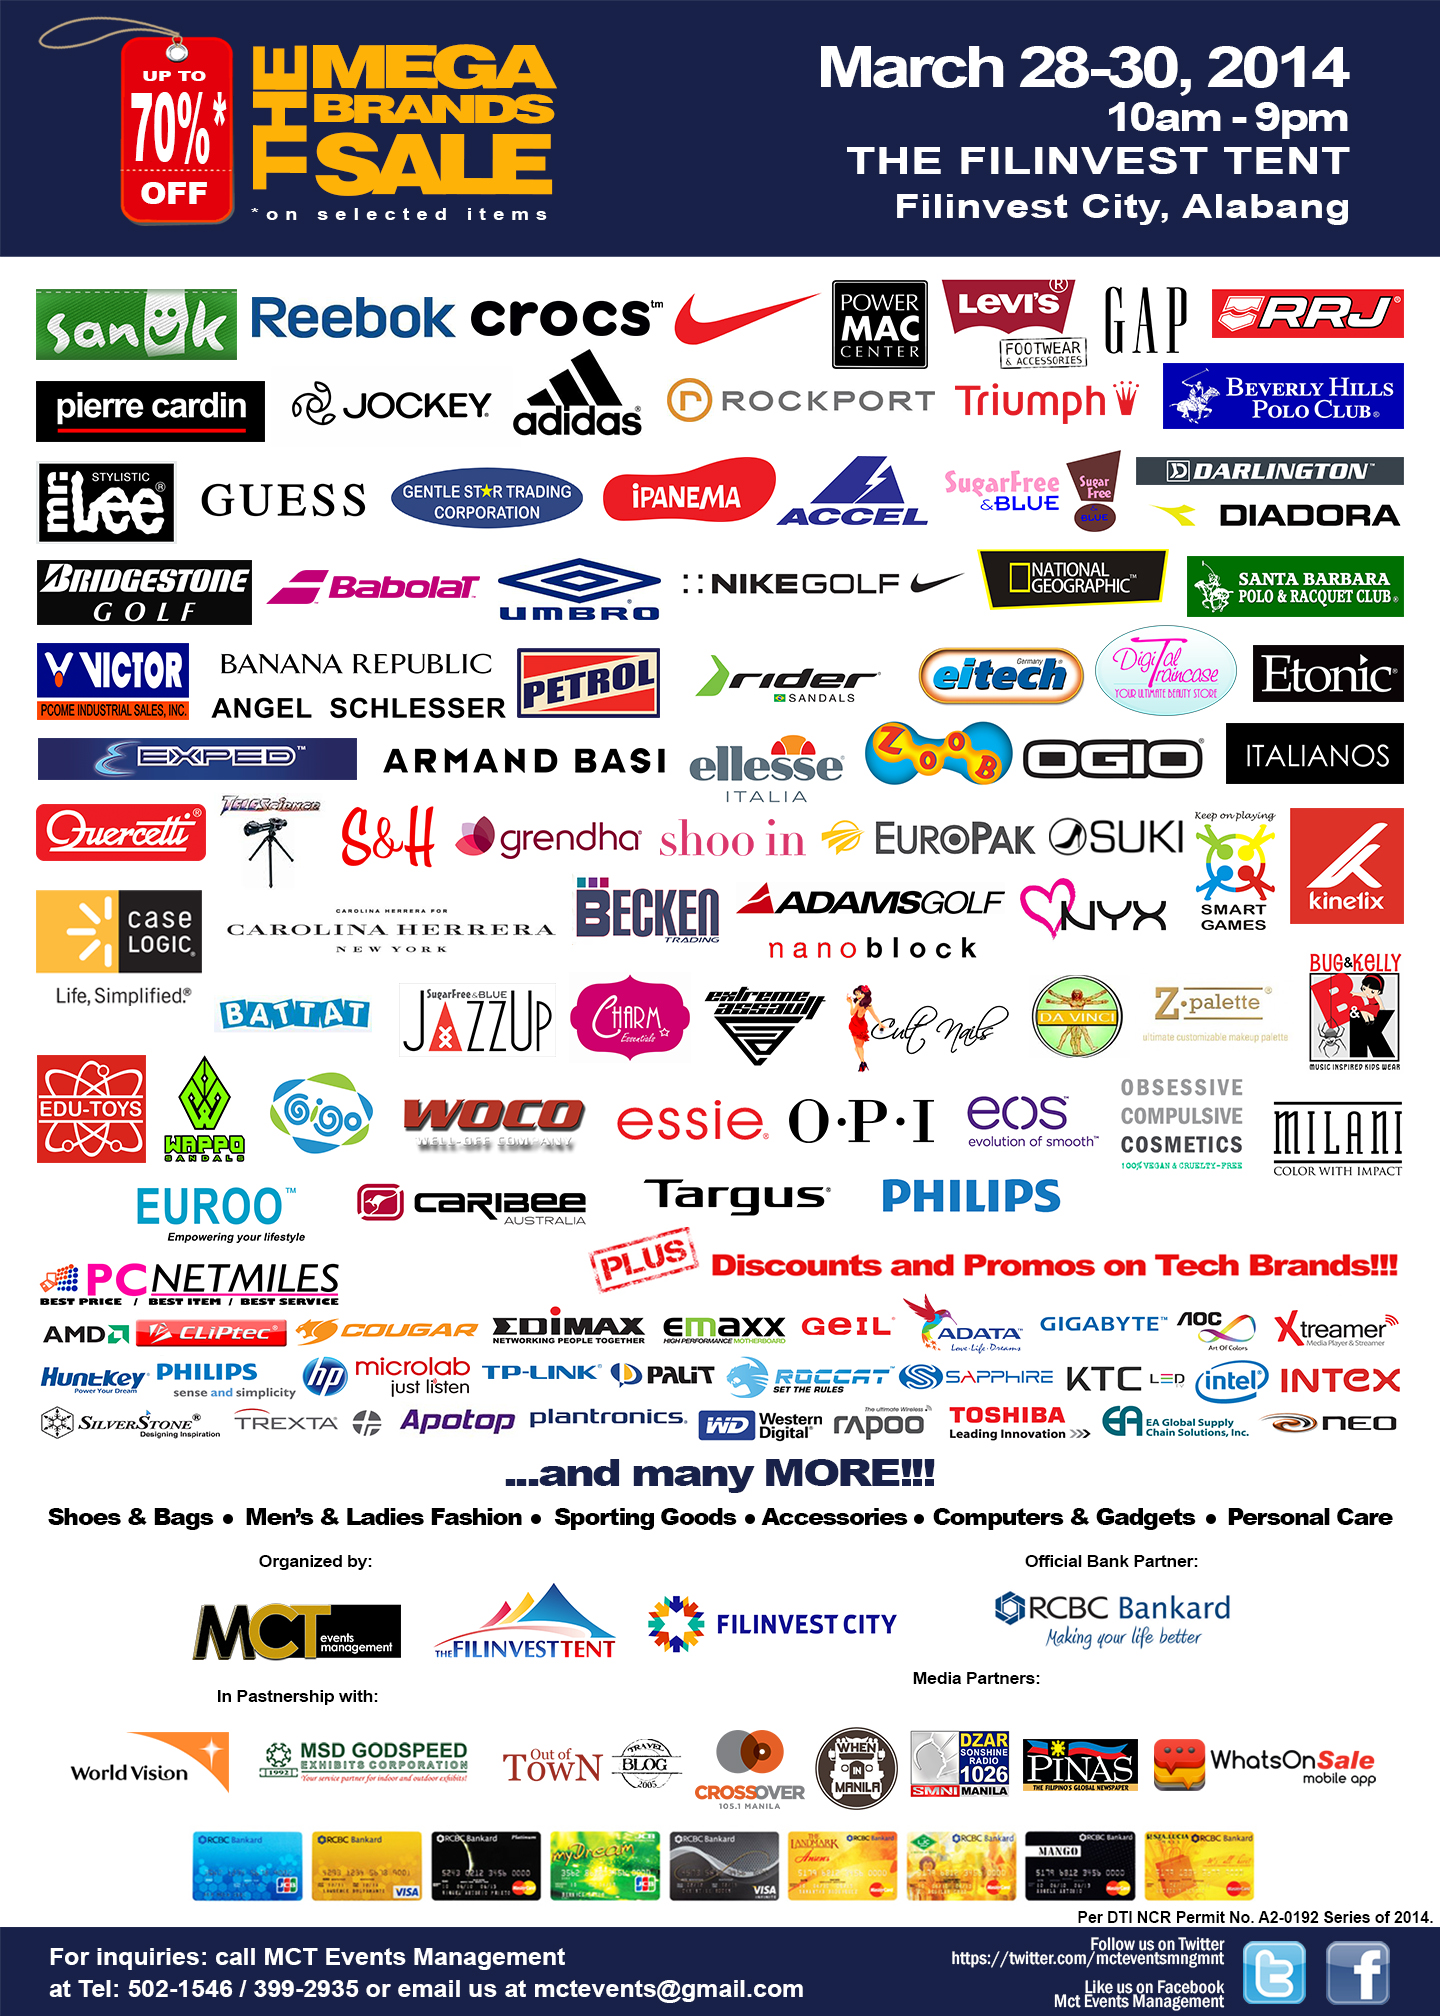 7th MegaBrands Sale @ Filinvest Tent March 2014